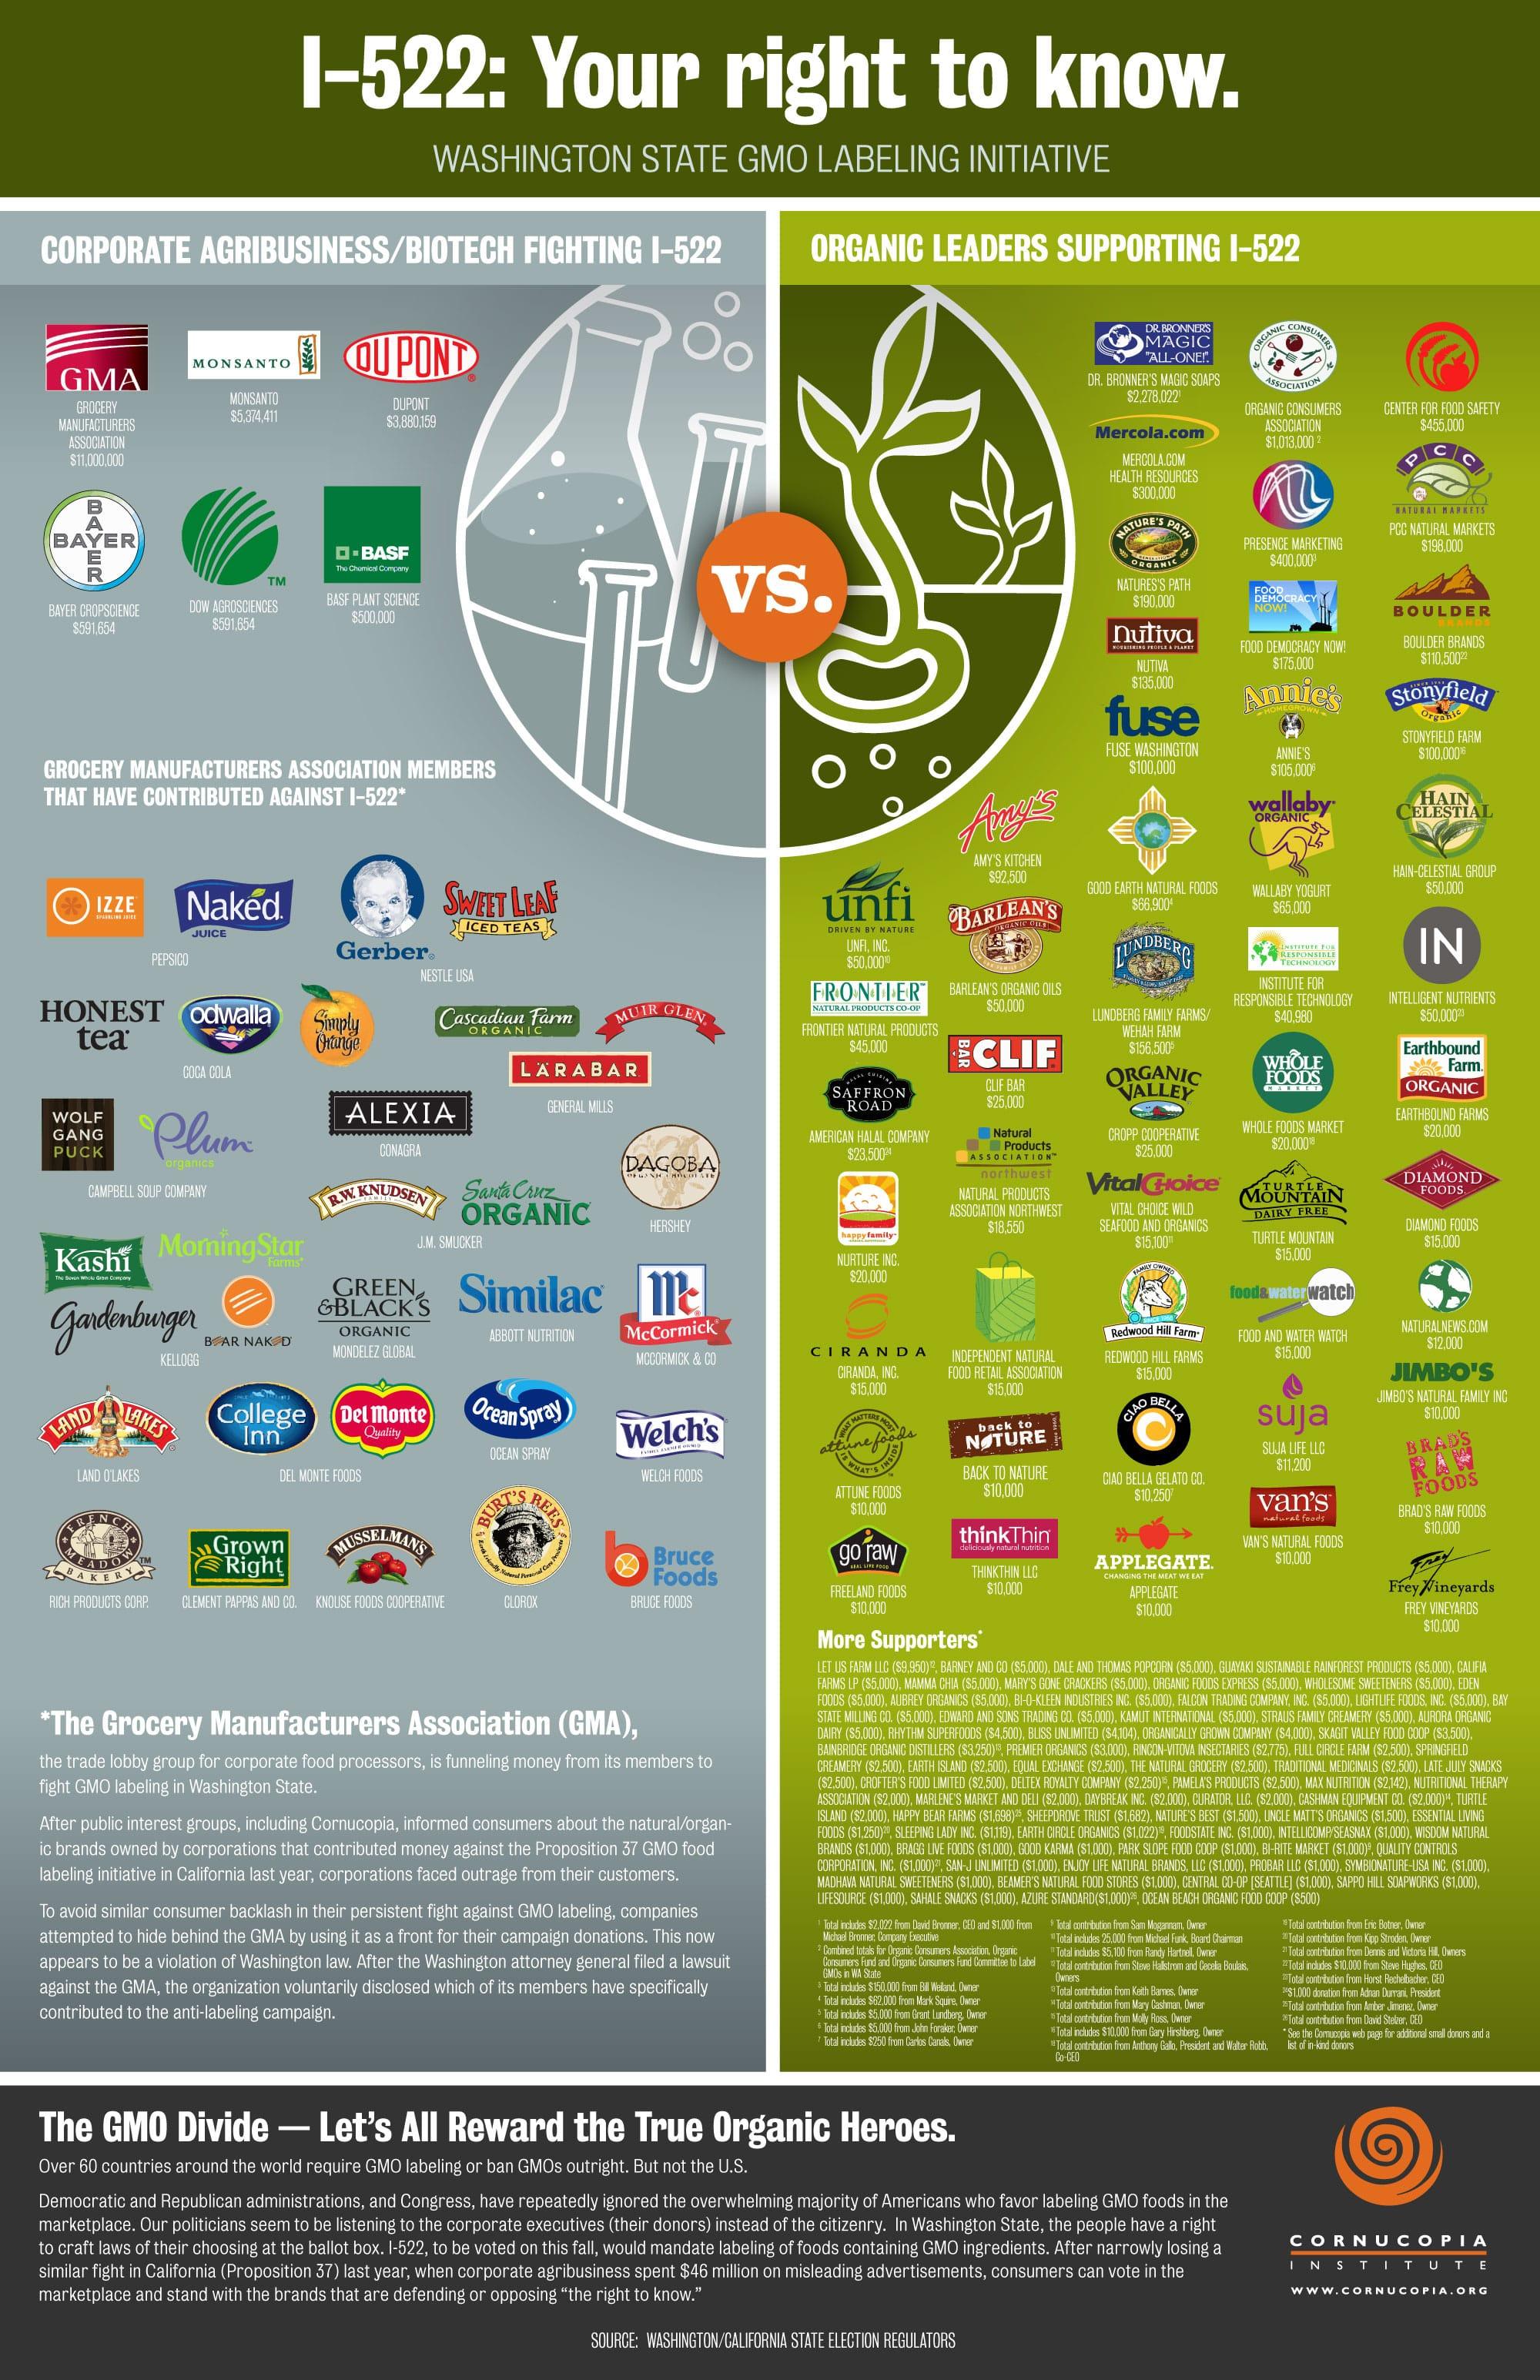 http://www.cornucopia.org/wp-content/uploads/2013/11/I-522.poster.1101.jpg